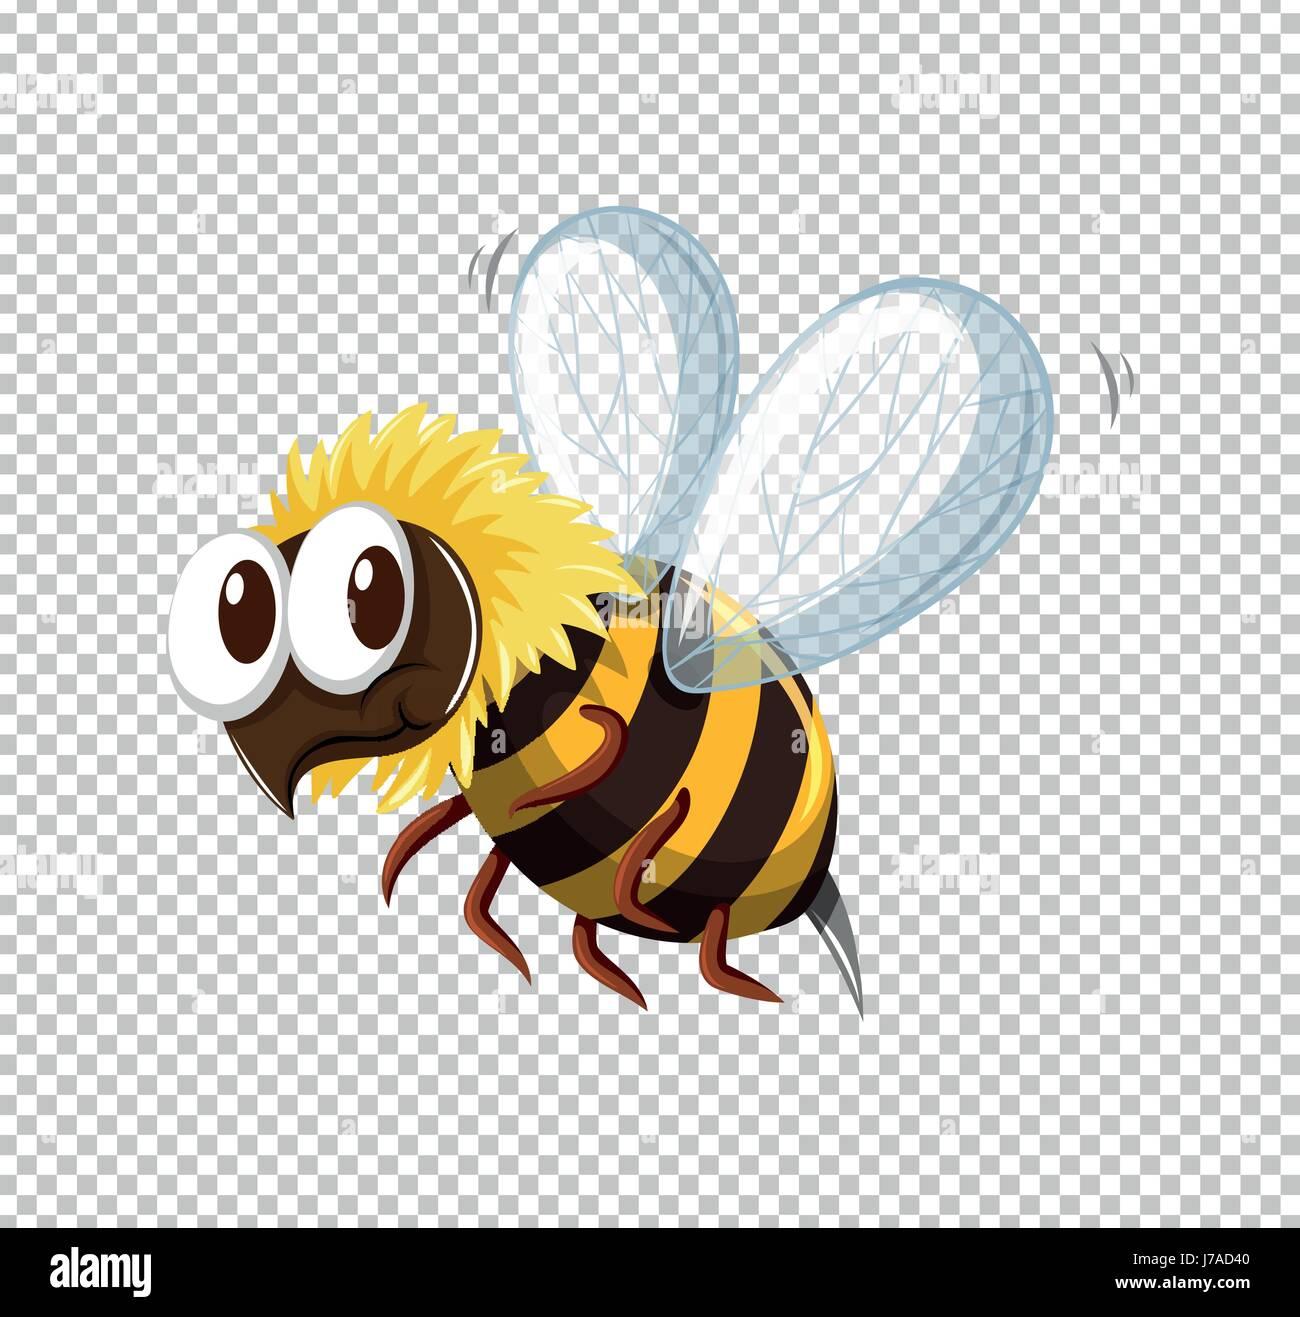 Little Bee Flying On Transparent Background Illustration